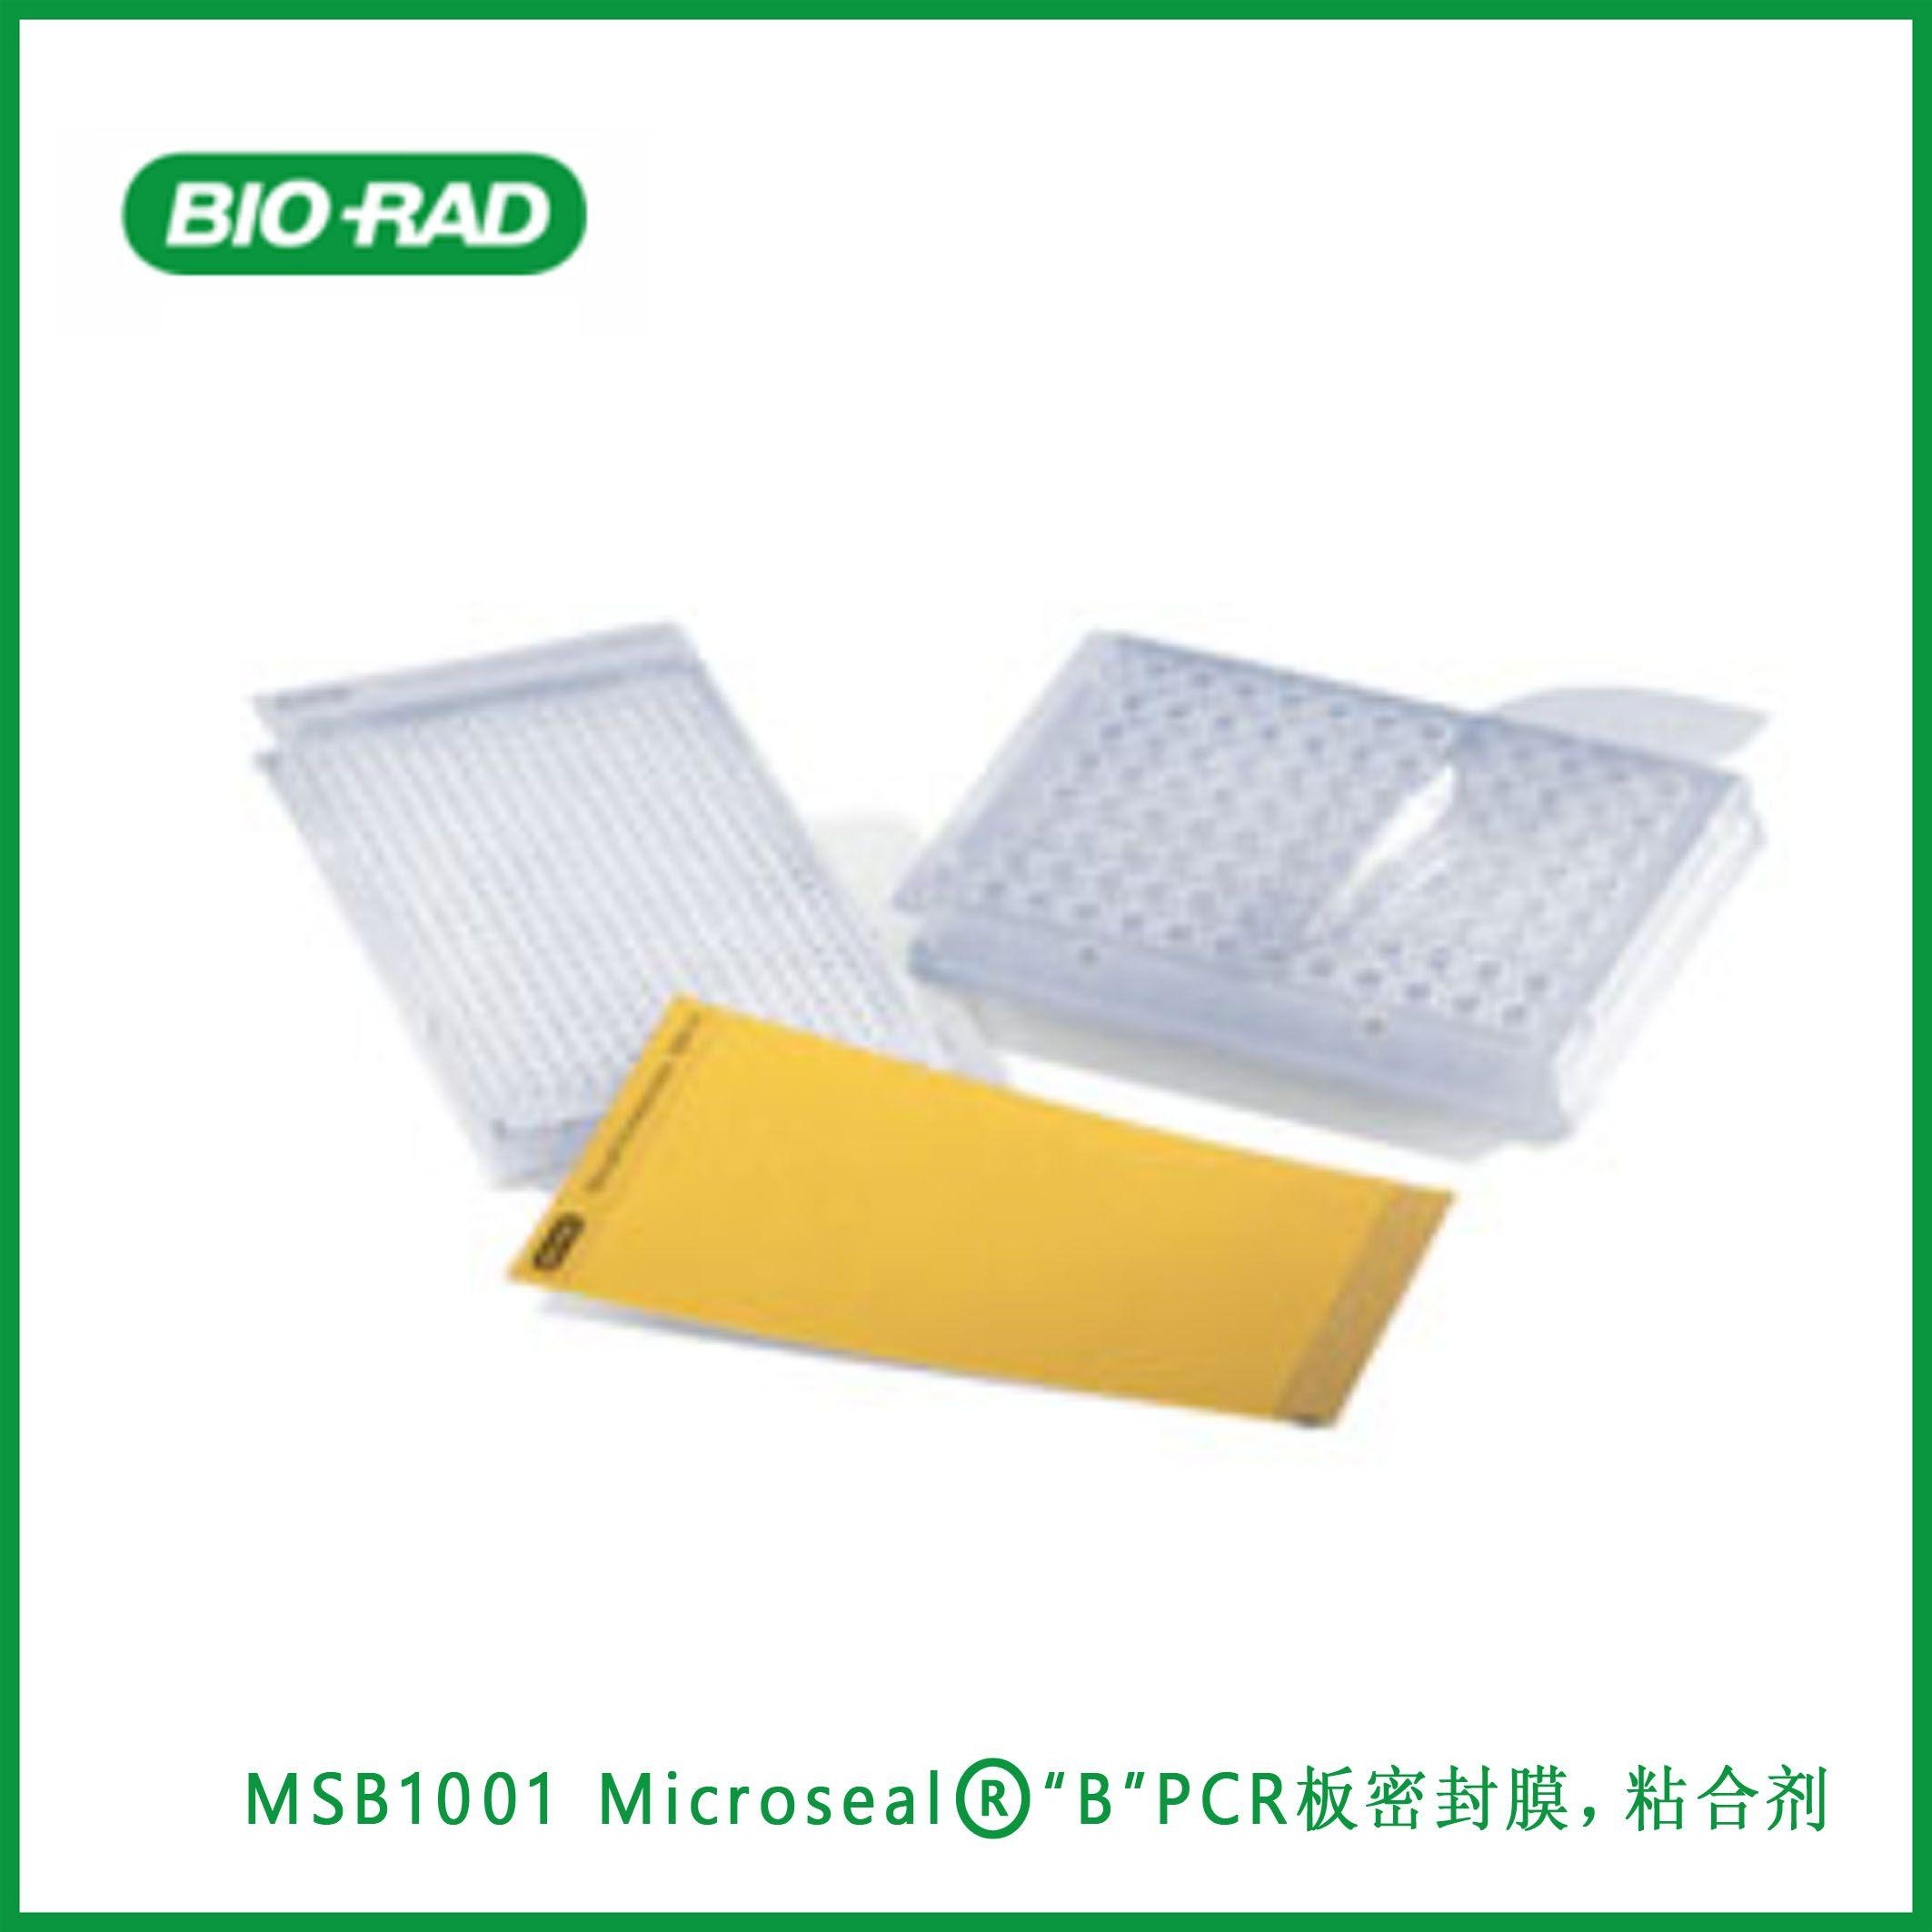 "伯乐Bio-RadMSB1001 Microseal ® 'B' PCR Plate Sealing Film, adhesive, optical, Microseal ® ""B""PCR板密封膜,粘合剂,现货"